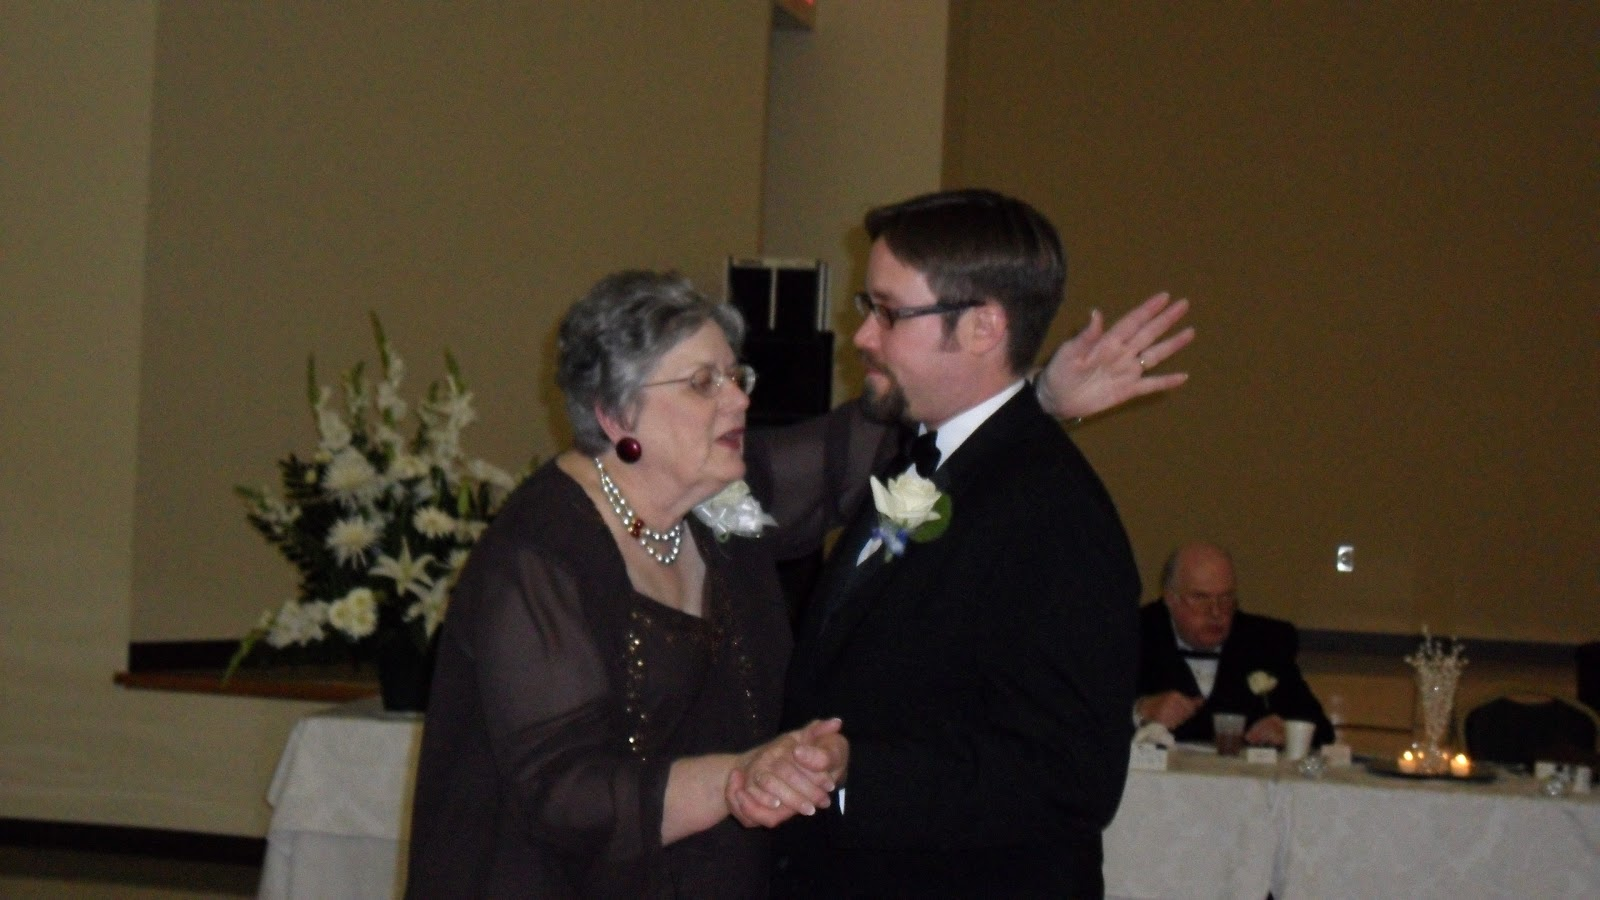 Our Wedding, photos by Rachel Perez - SAM_0195.JPG